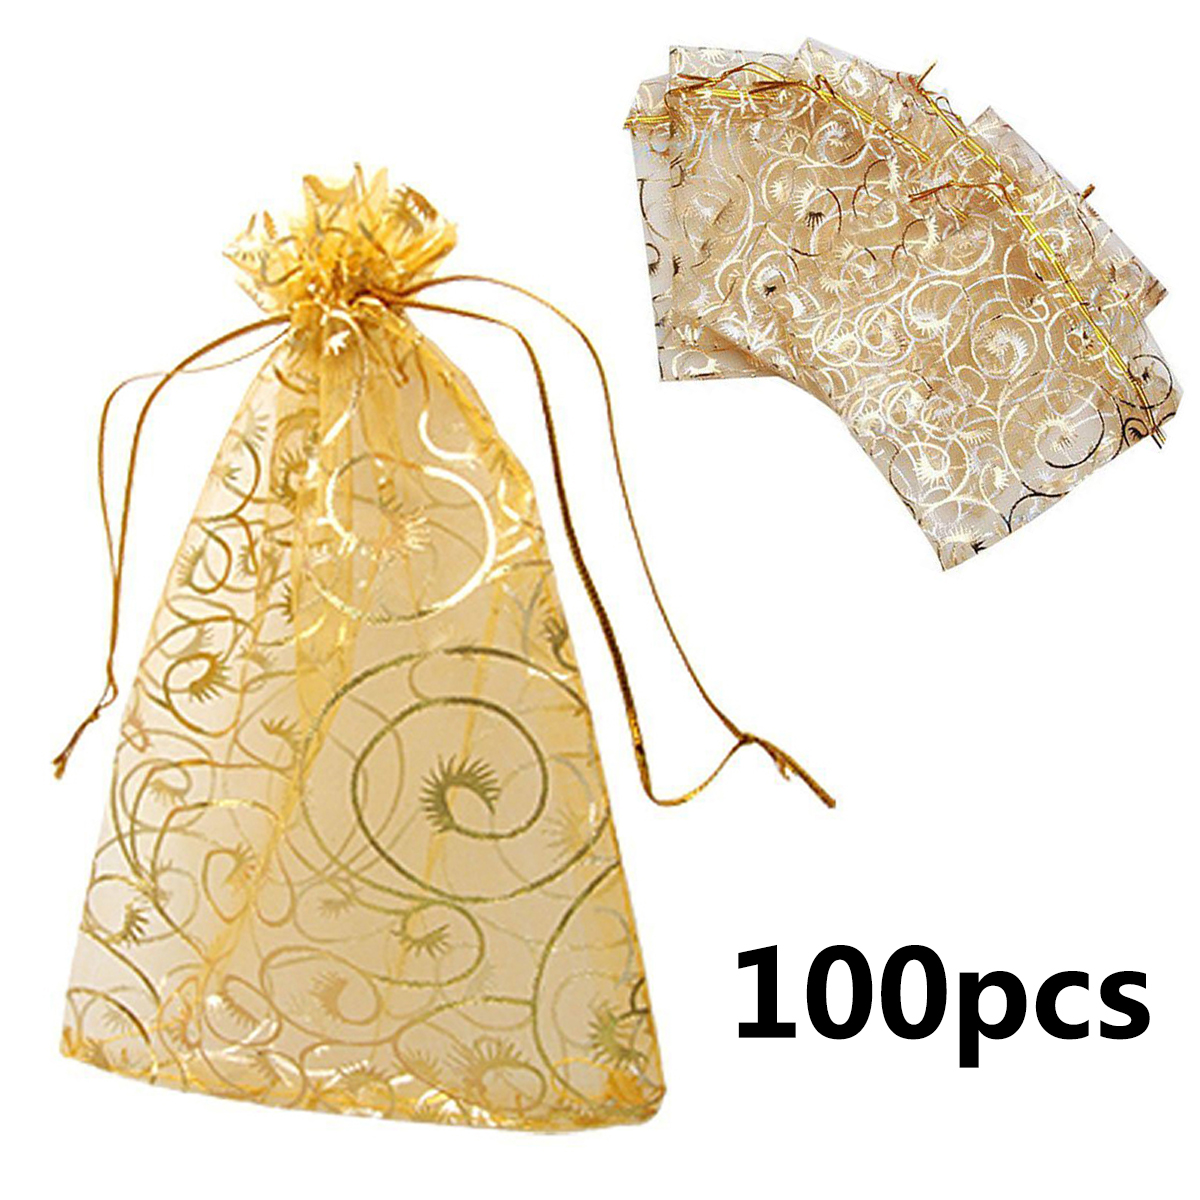 100pcs/lot Organza Bags  Coralline Custom Jewelry Tea Packaging Bags Organza Wedding Gift Bags Saquinho De Organza 9*12